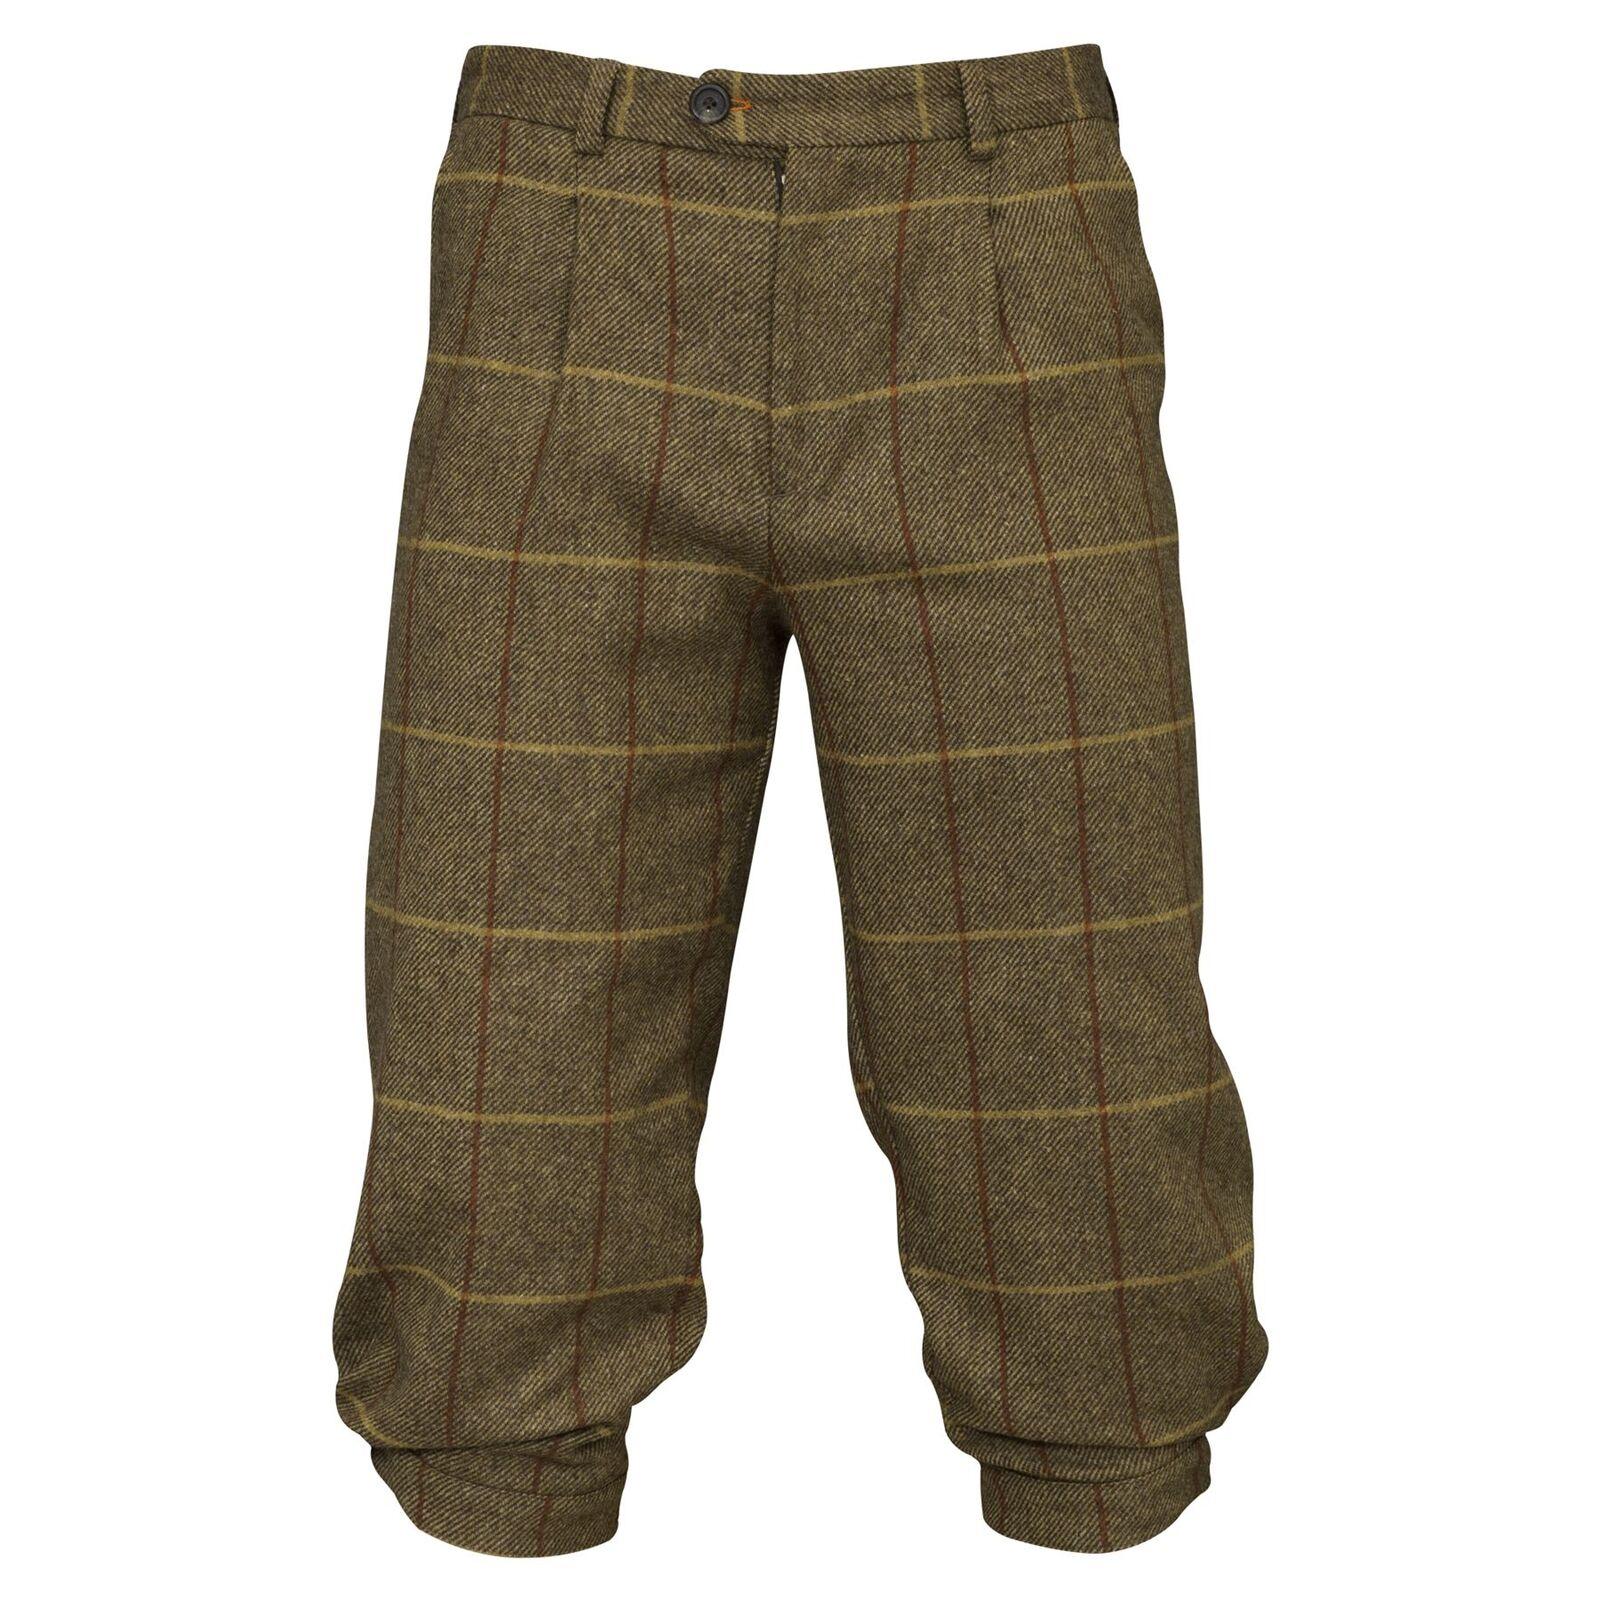 Alan Paine Surrey Mens Tweed Breeks-Moorland (Hunting Country Pursuits)